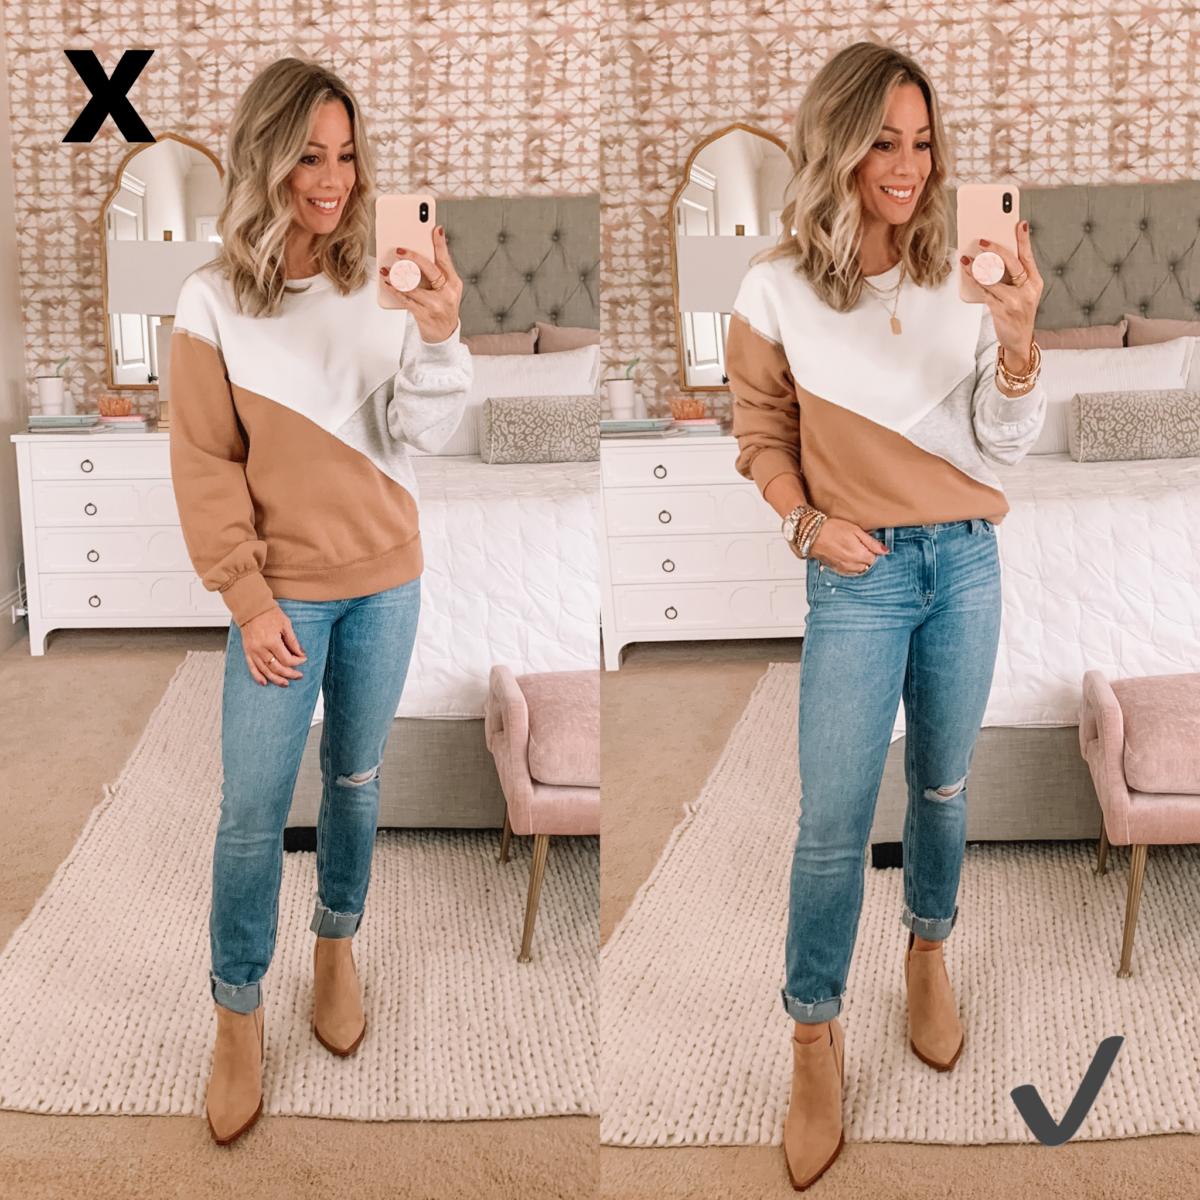 Abercrombie sweatshirt and jeans